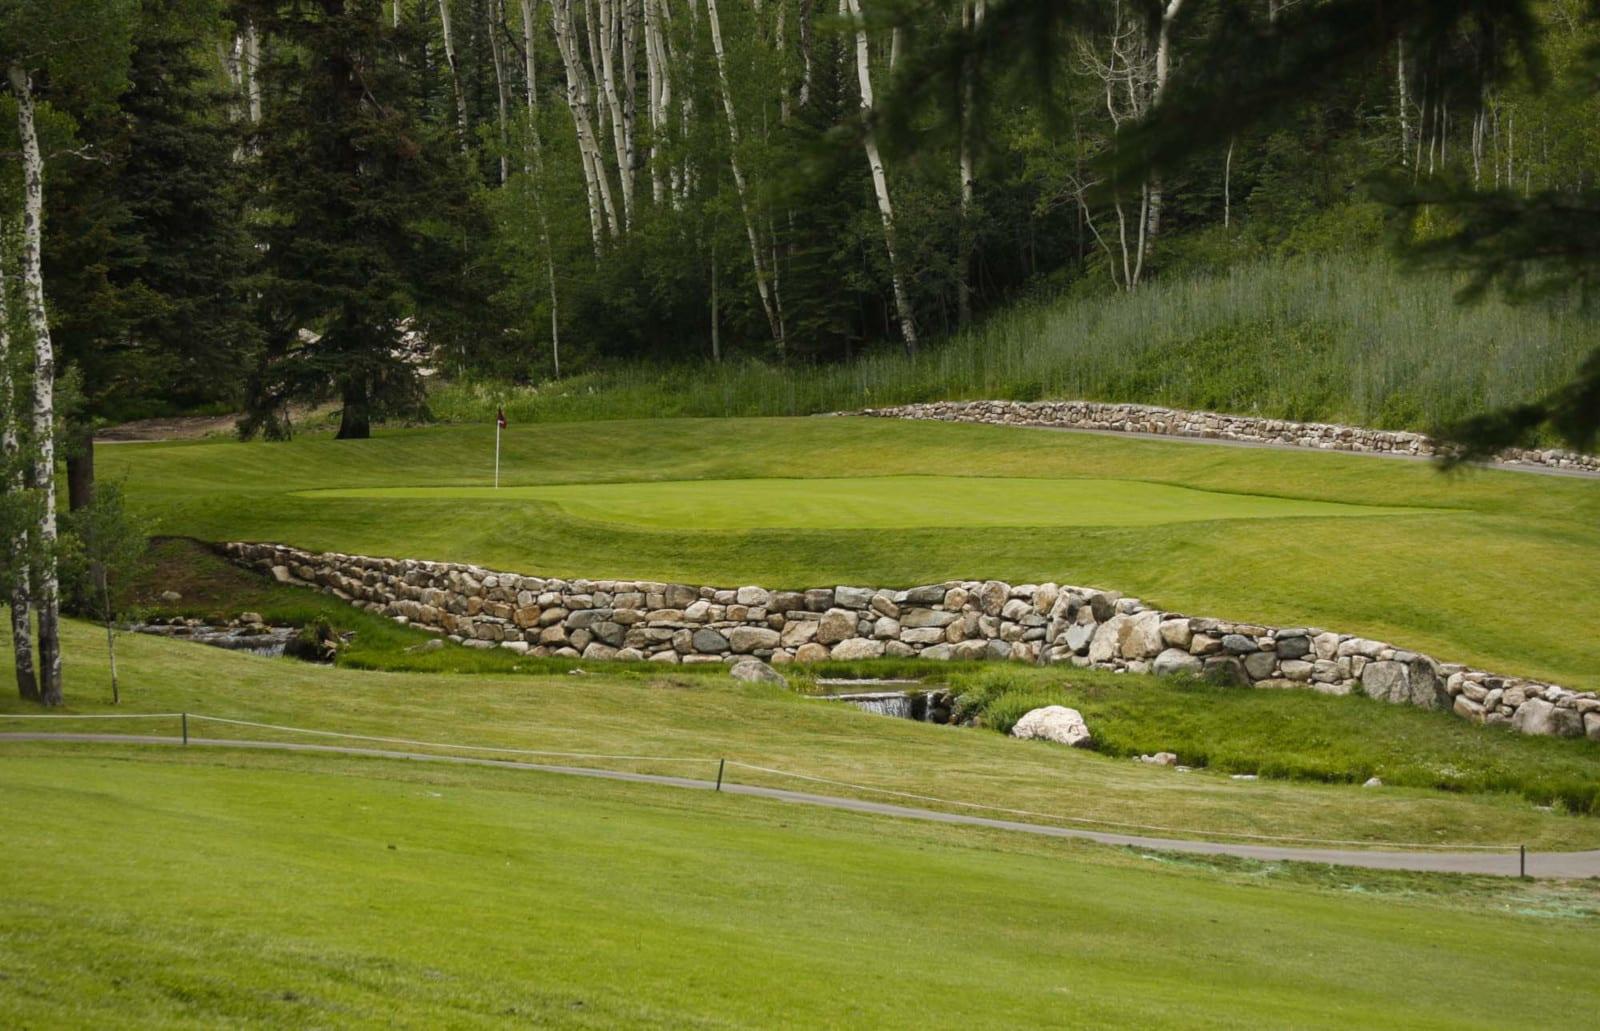 Eagle-Vail Colorado Eagle-Vail Golf Club Green